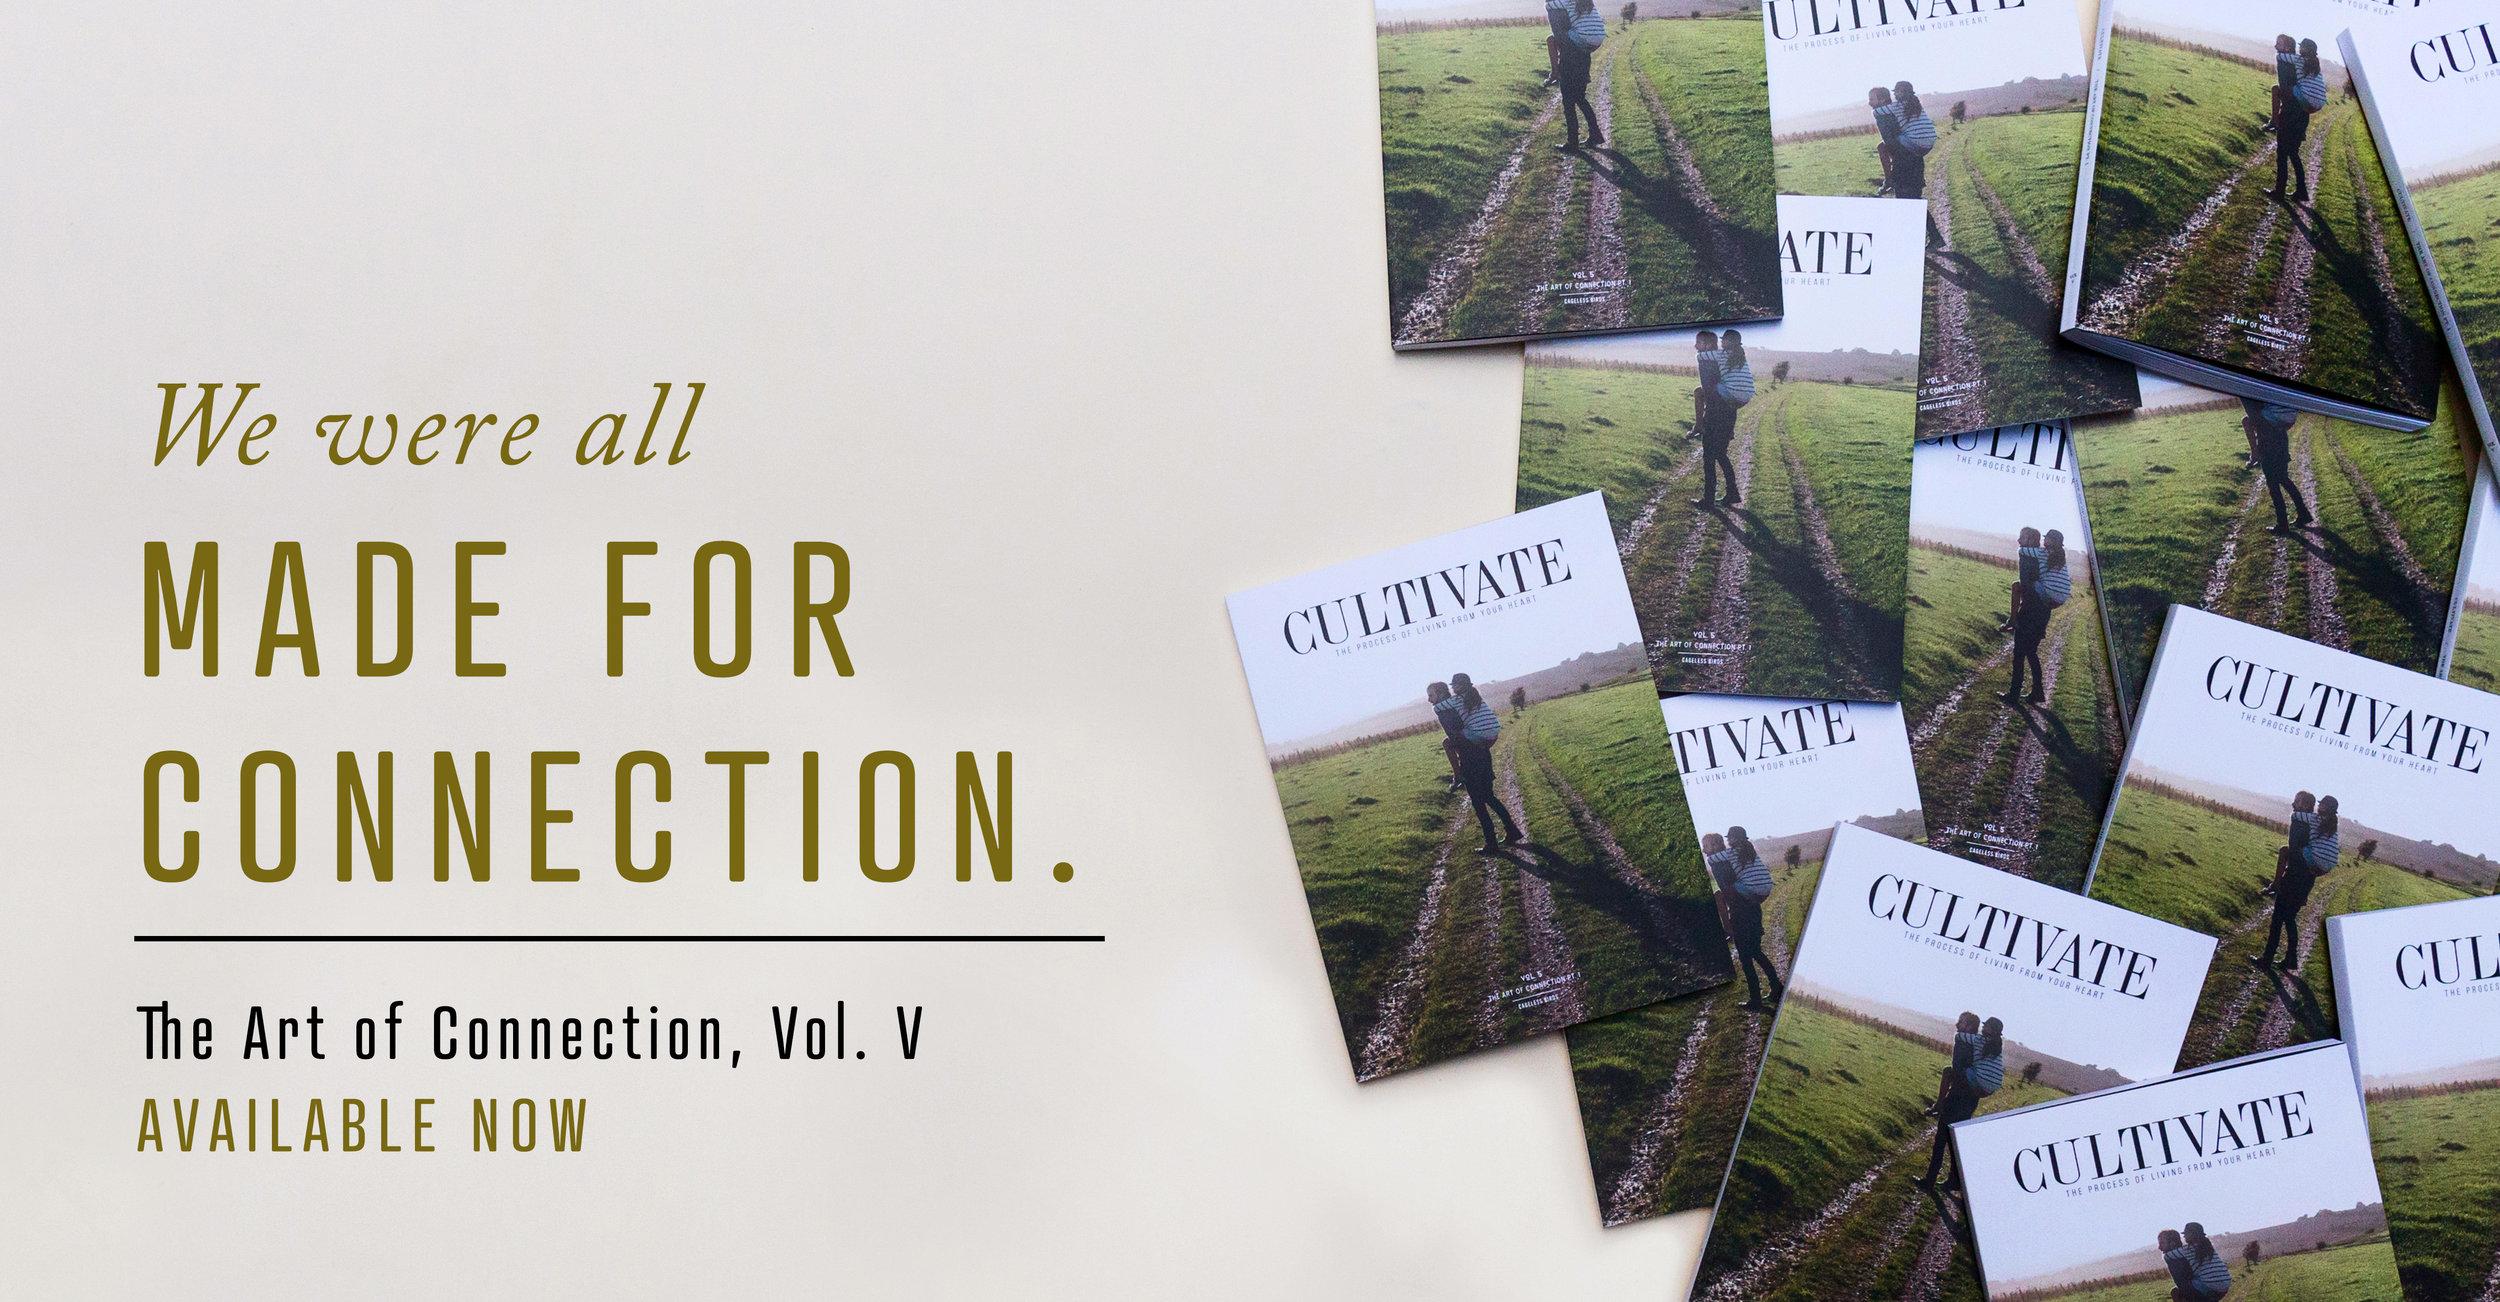 vol.5.promo.1 2 copy.jpg